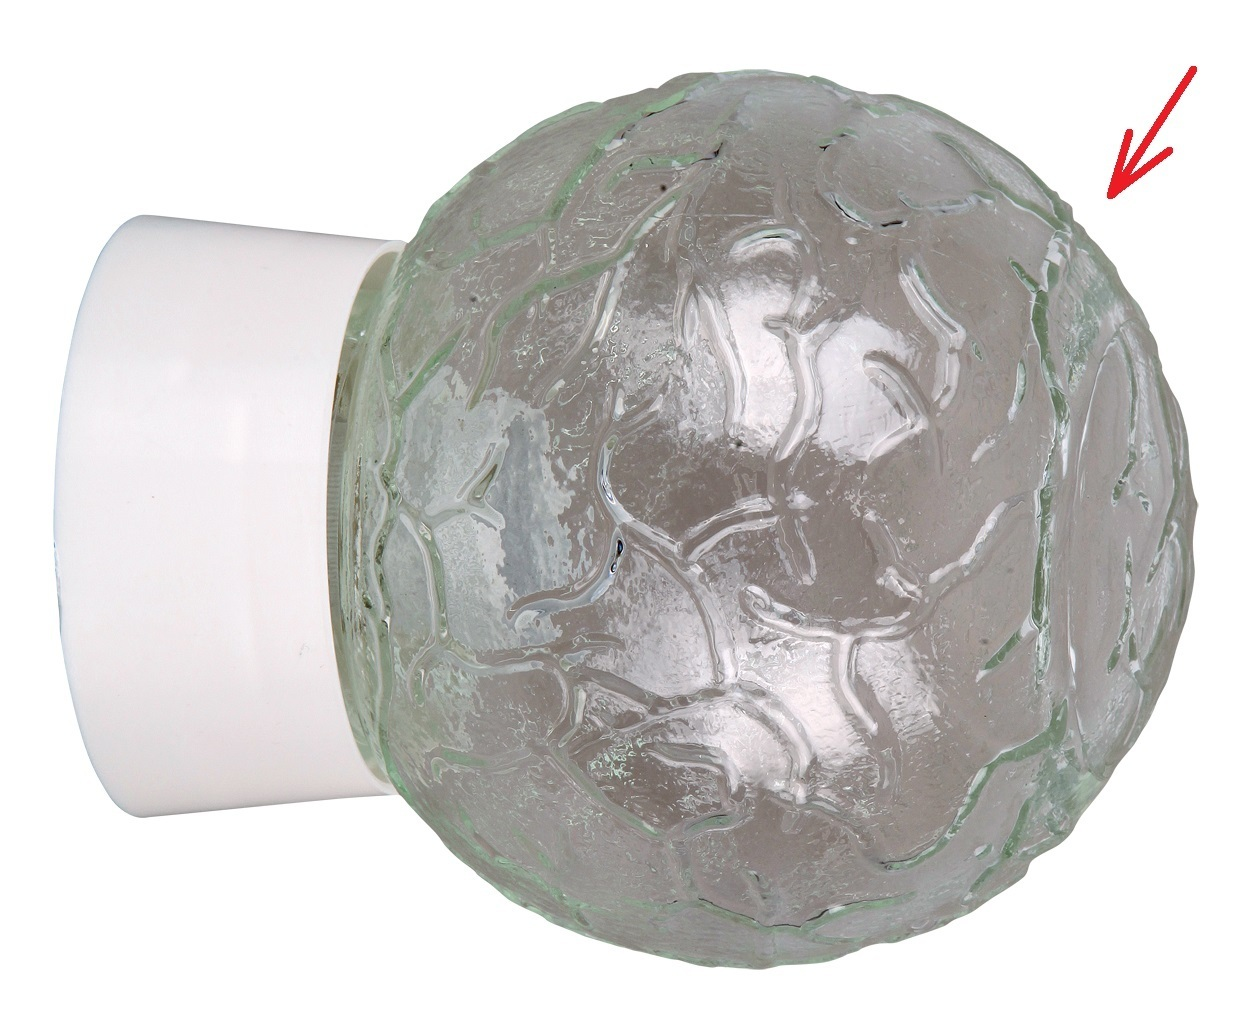 lampenschirm kugel aus glas f r e 14 27 durchmesser 14 cm grace. Black Bedroom Furniture Sets. Home Design Ideas